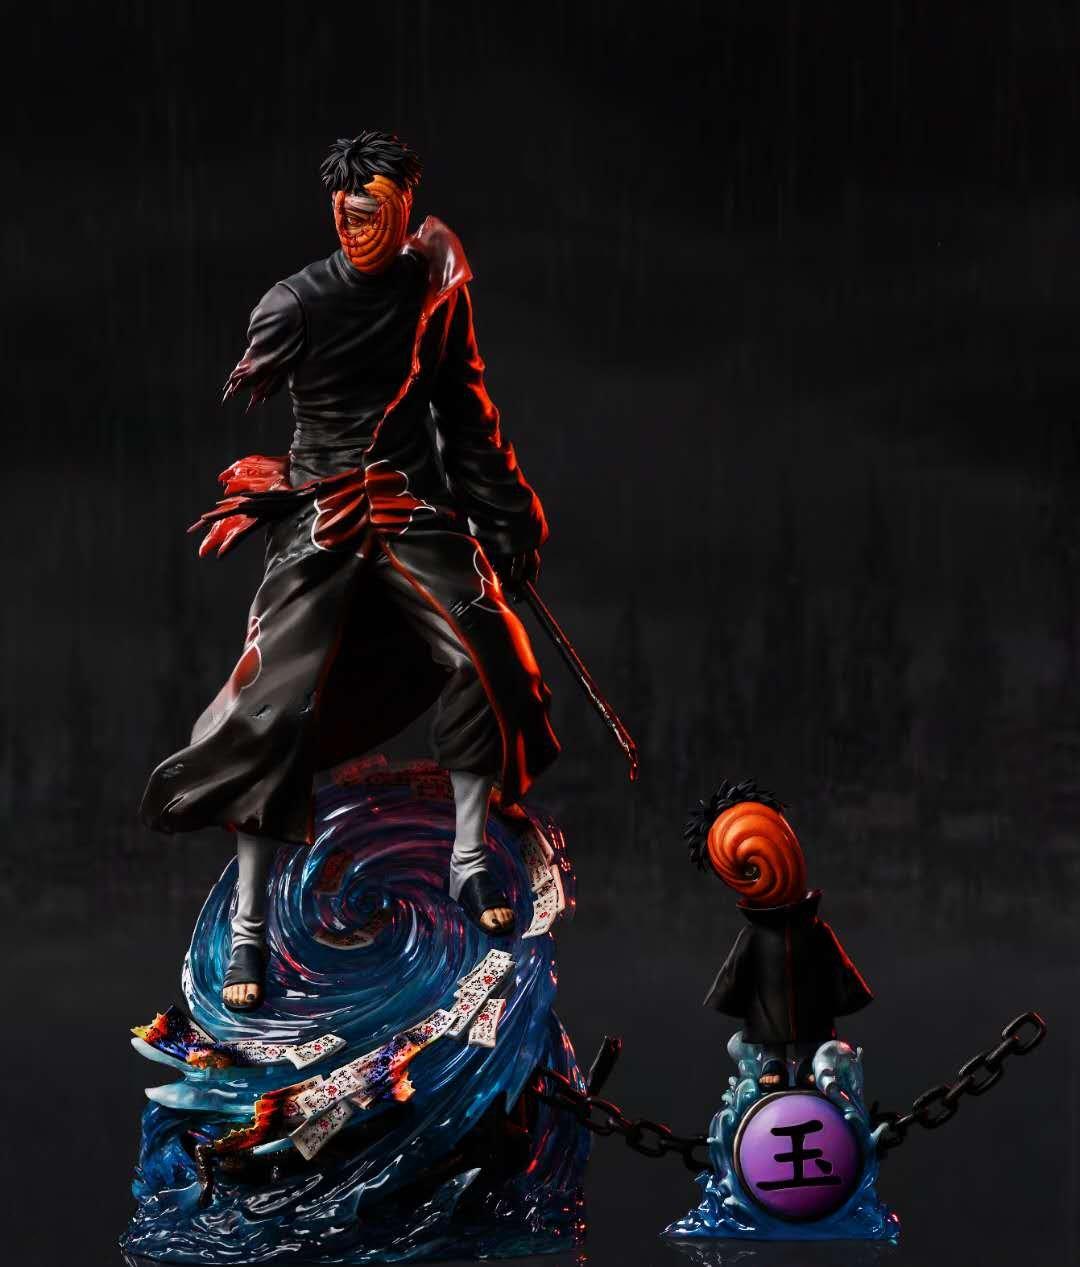 Image of [Last-Stock]Naruto CW Studio Battle Damaged Series Vol.1 Tobi Resin Statue